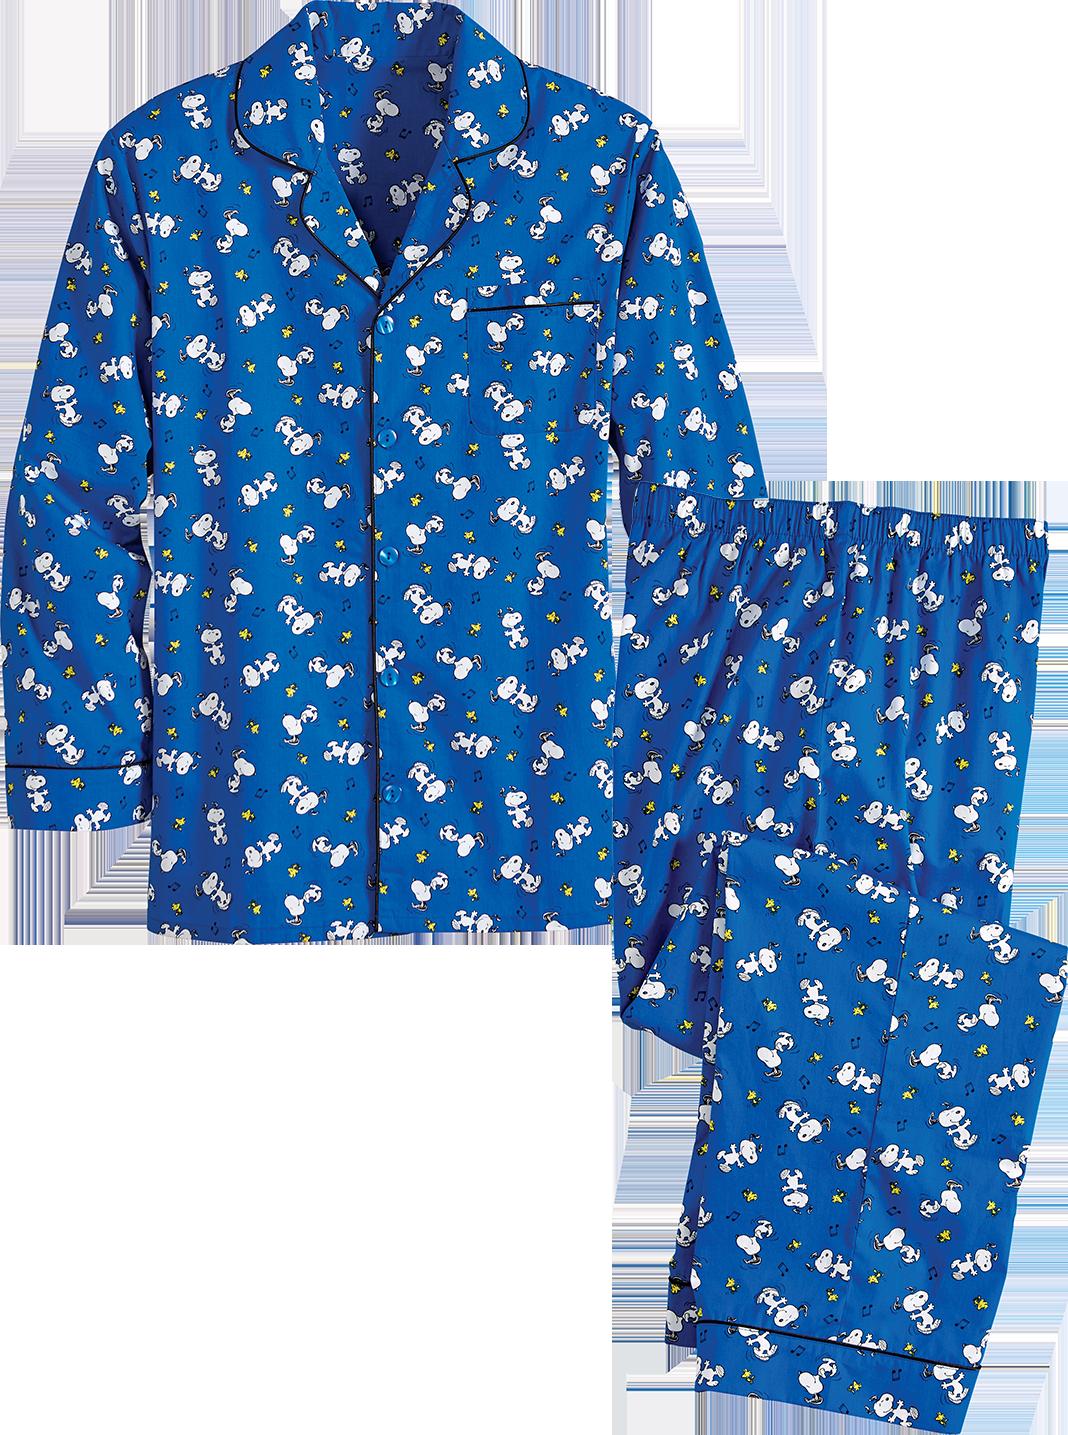 Pajamas Images Usseek Com